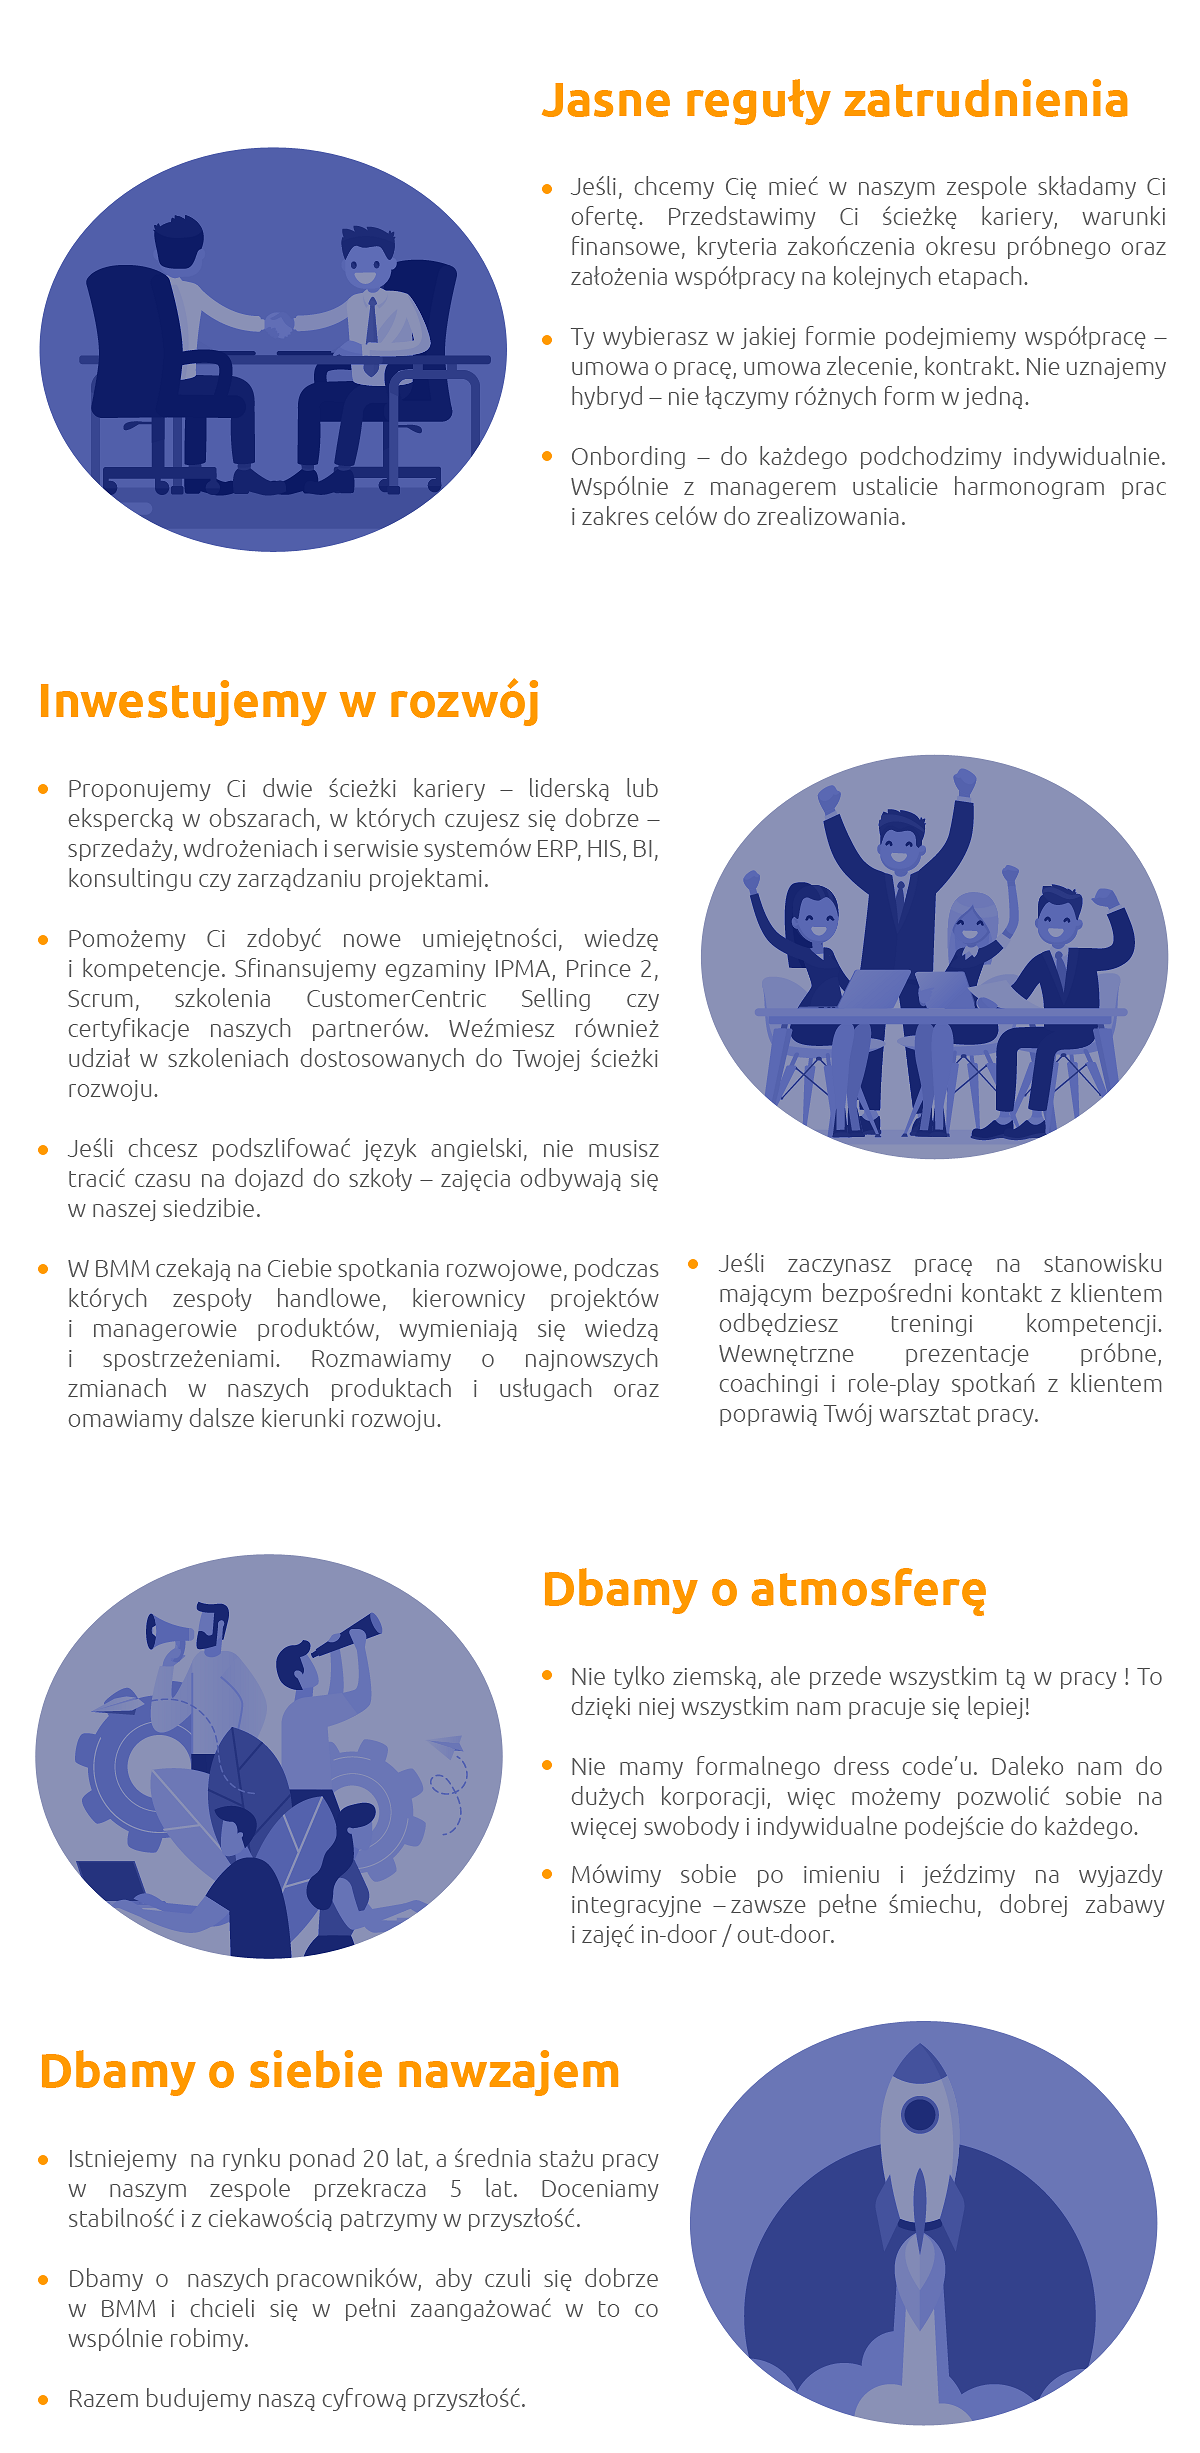 infografika.png [306.43 KB]